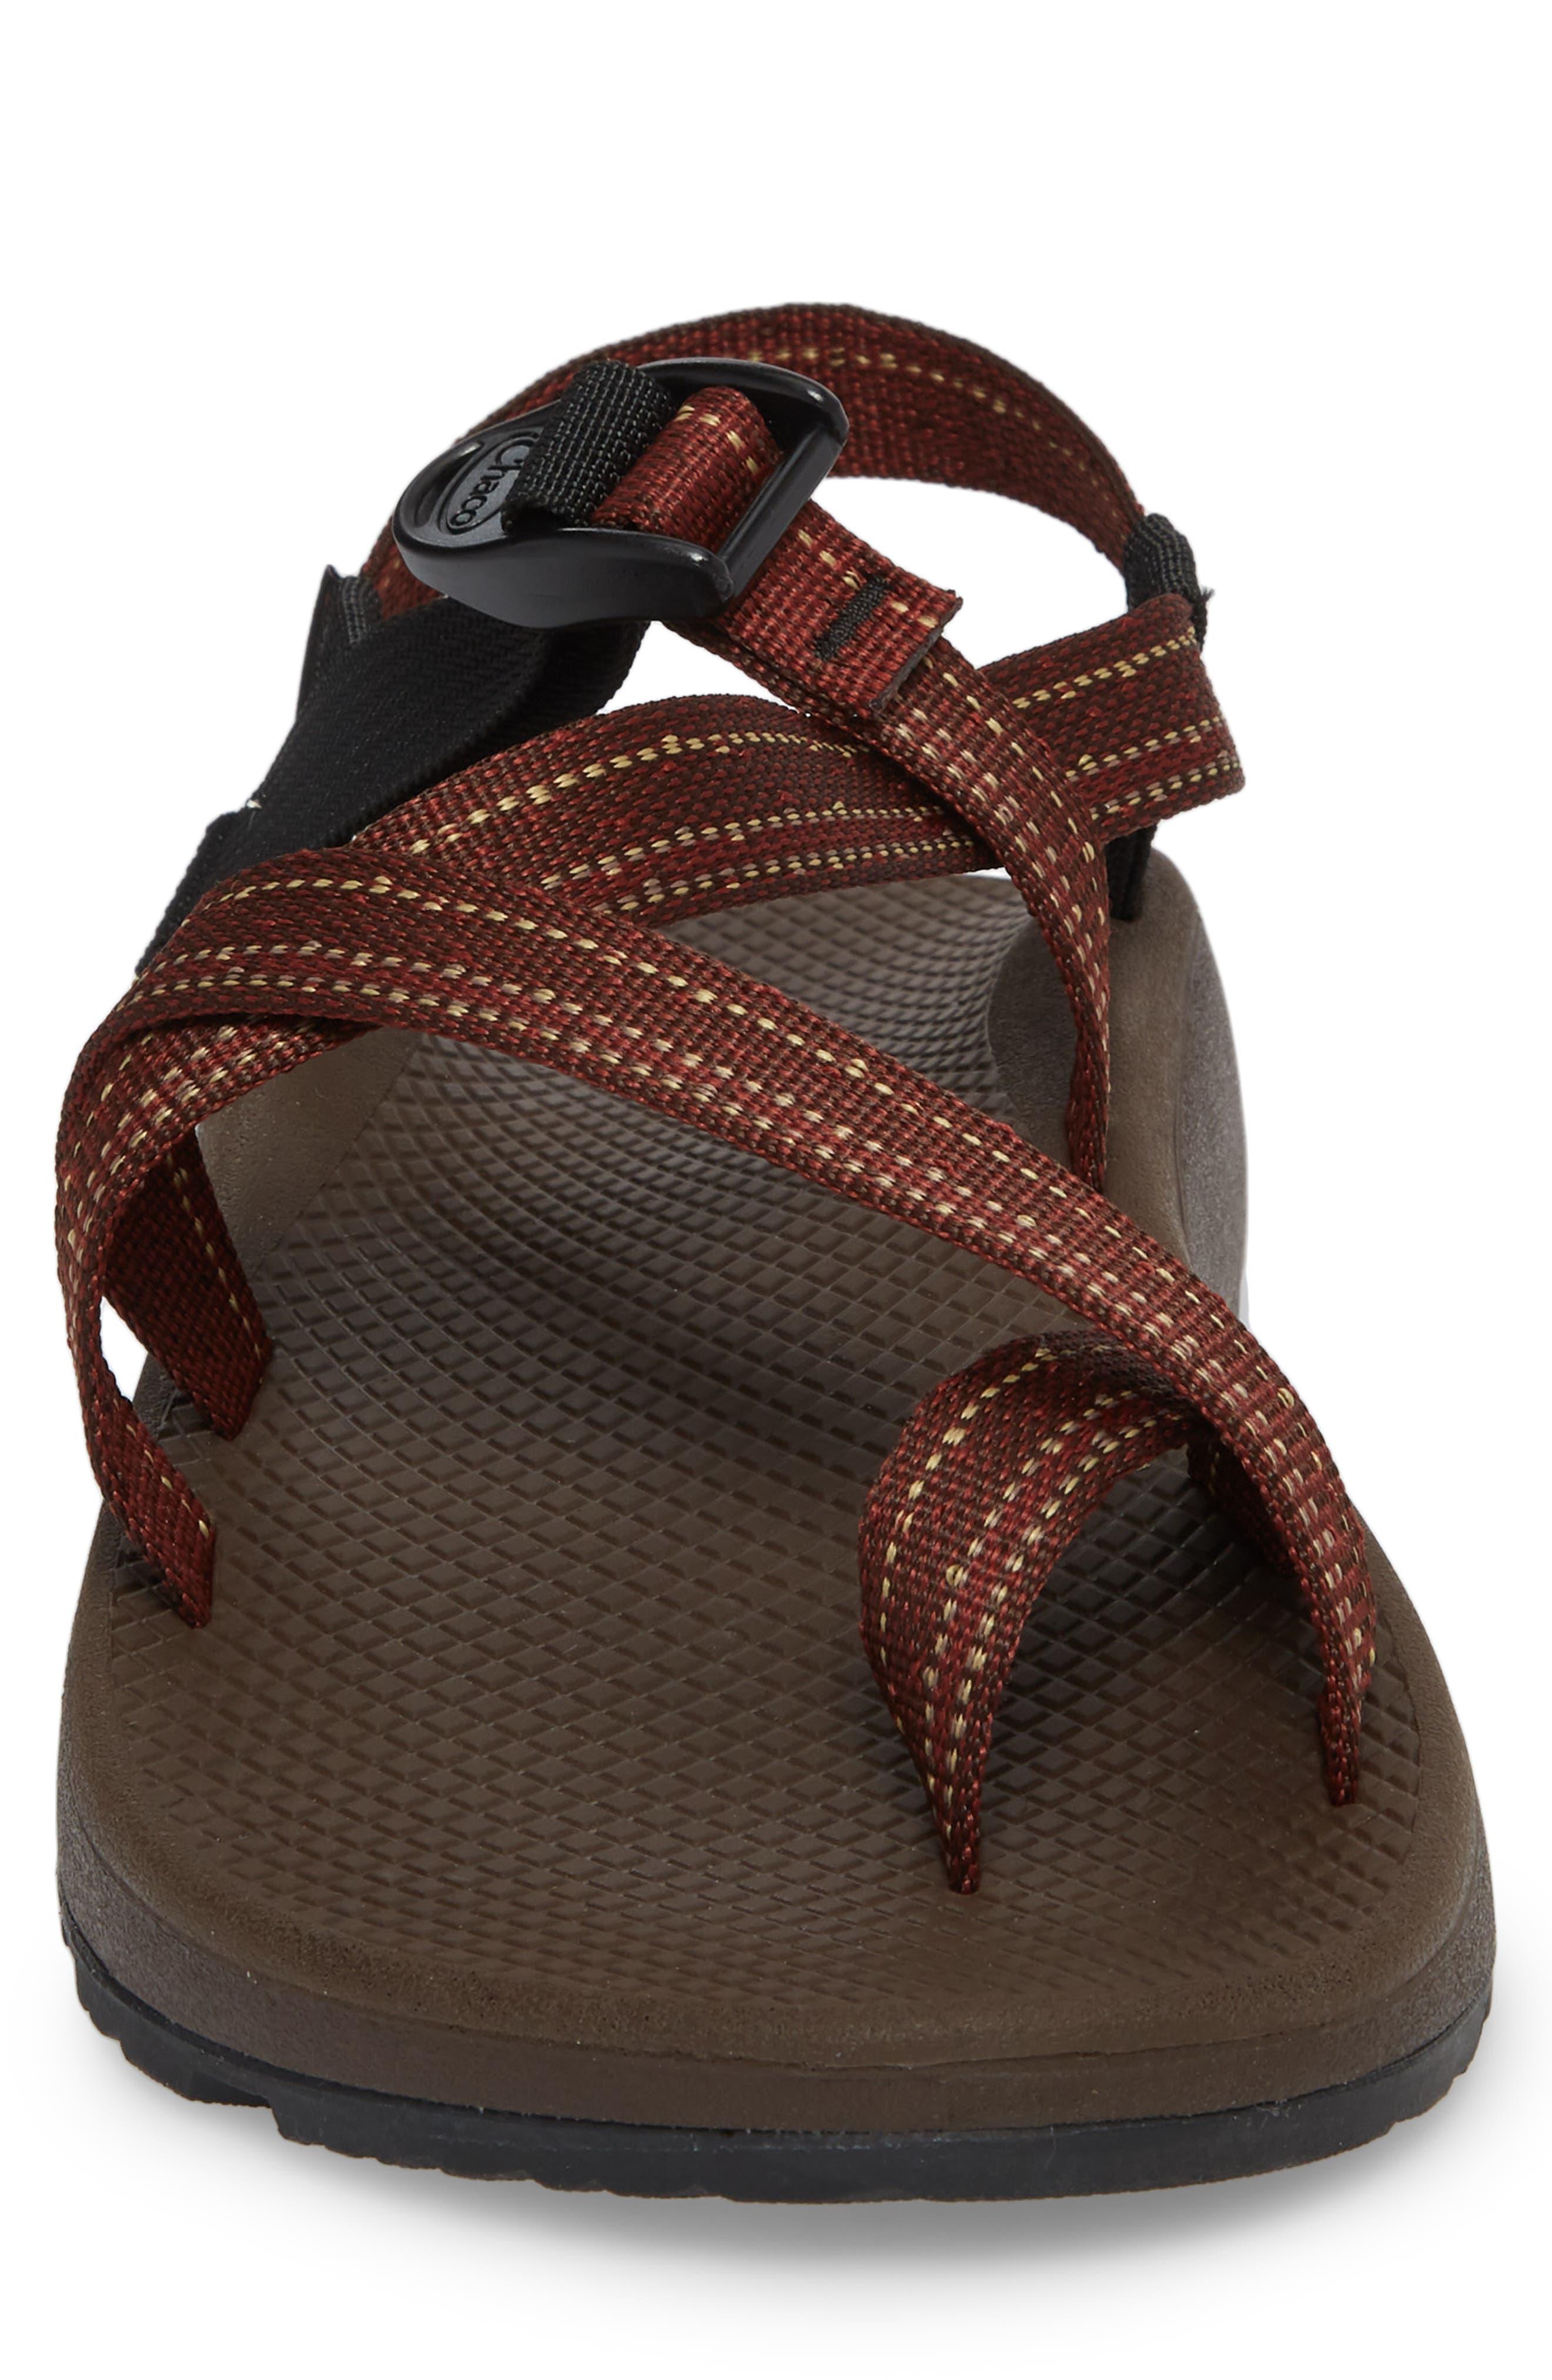 Z/Cloud 2 Sport Sandal,                             Alternate thumbnail 4, color,                             Seam Rust